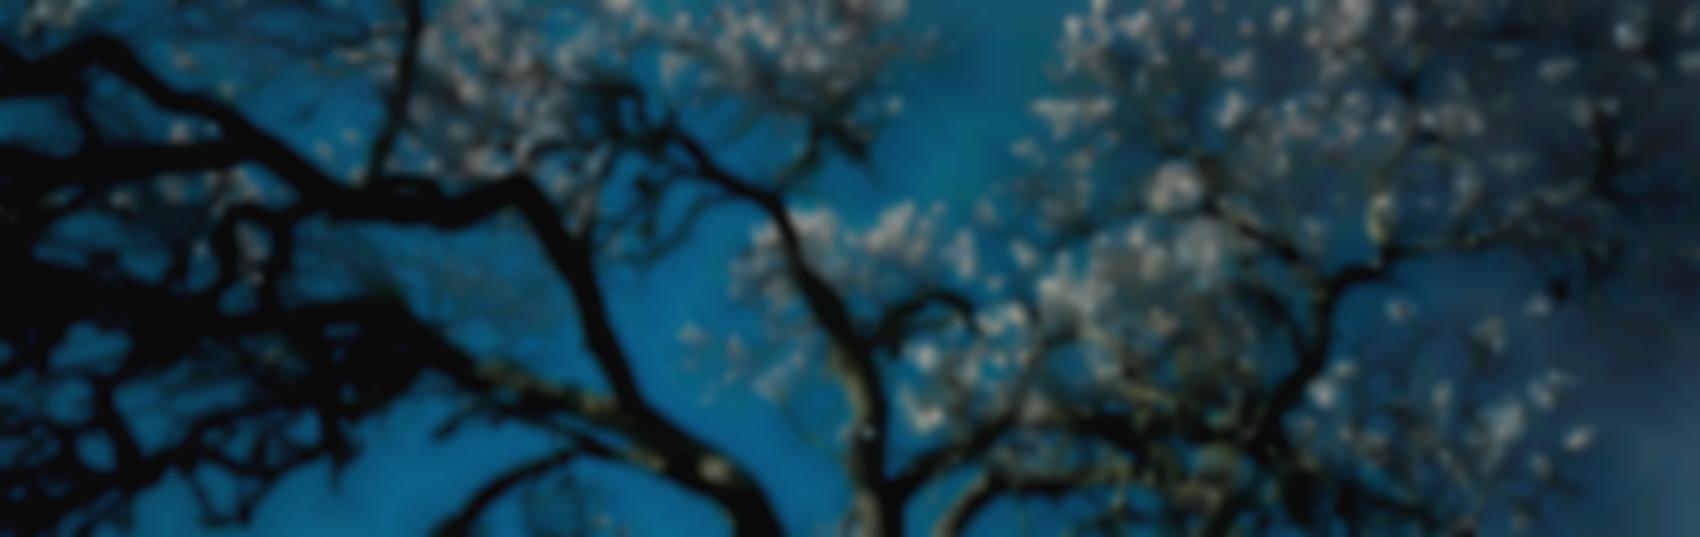 Hubertus Hamm-Almond Blossom-2004